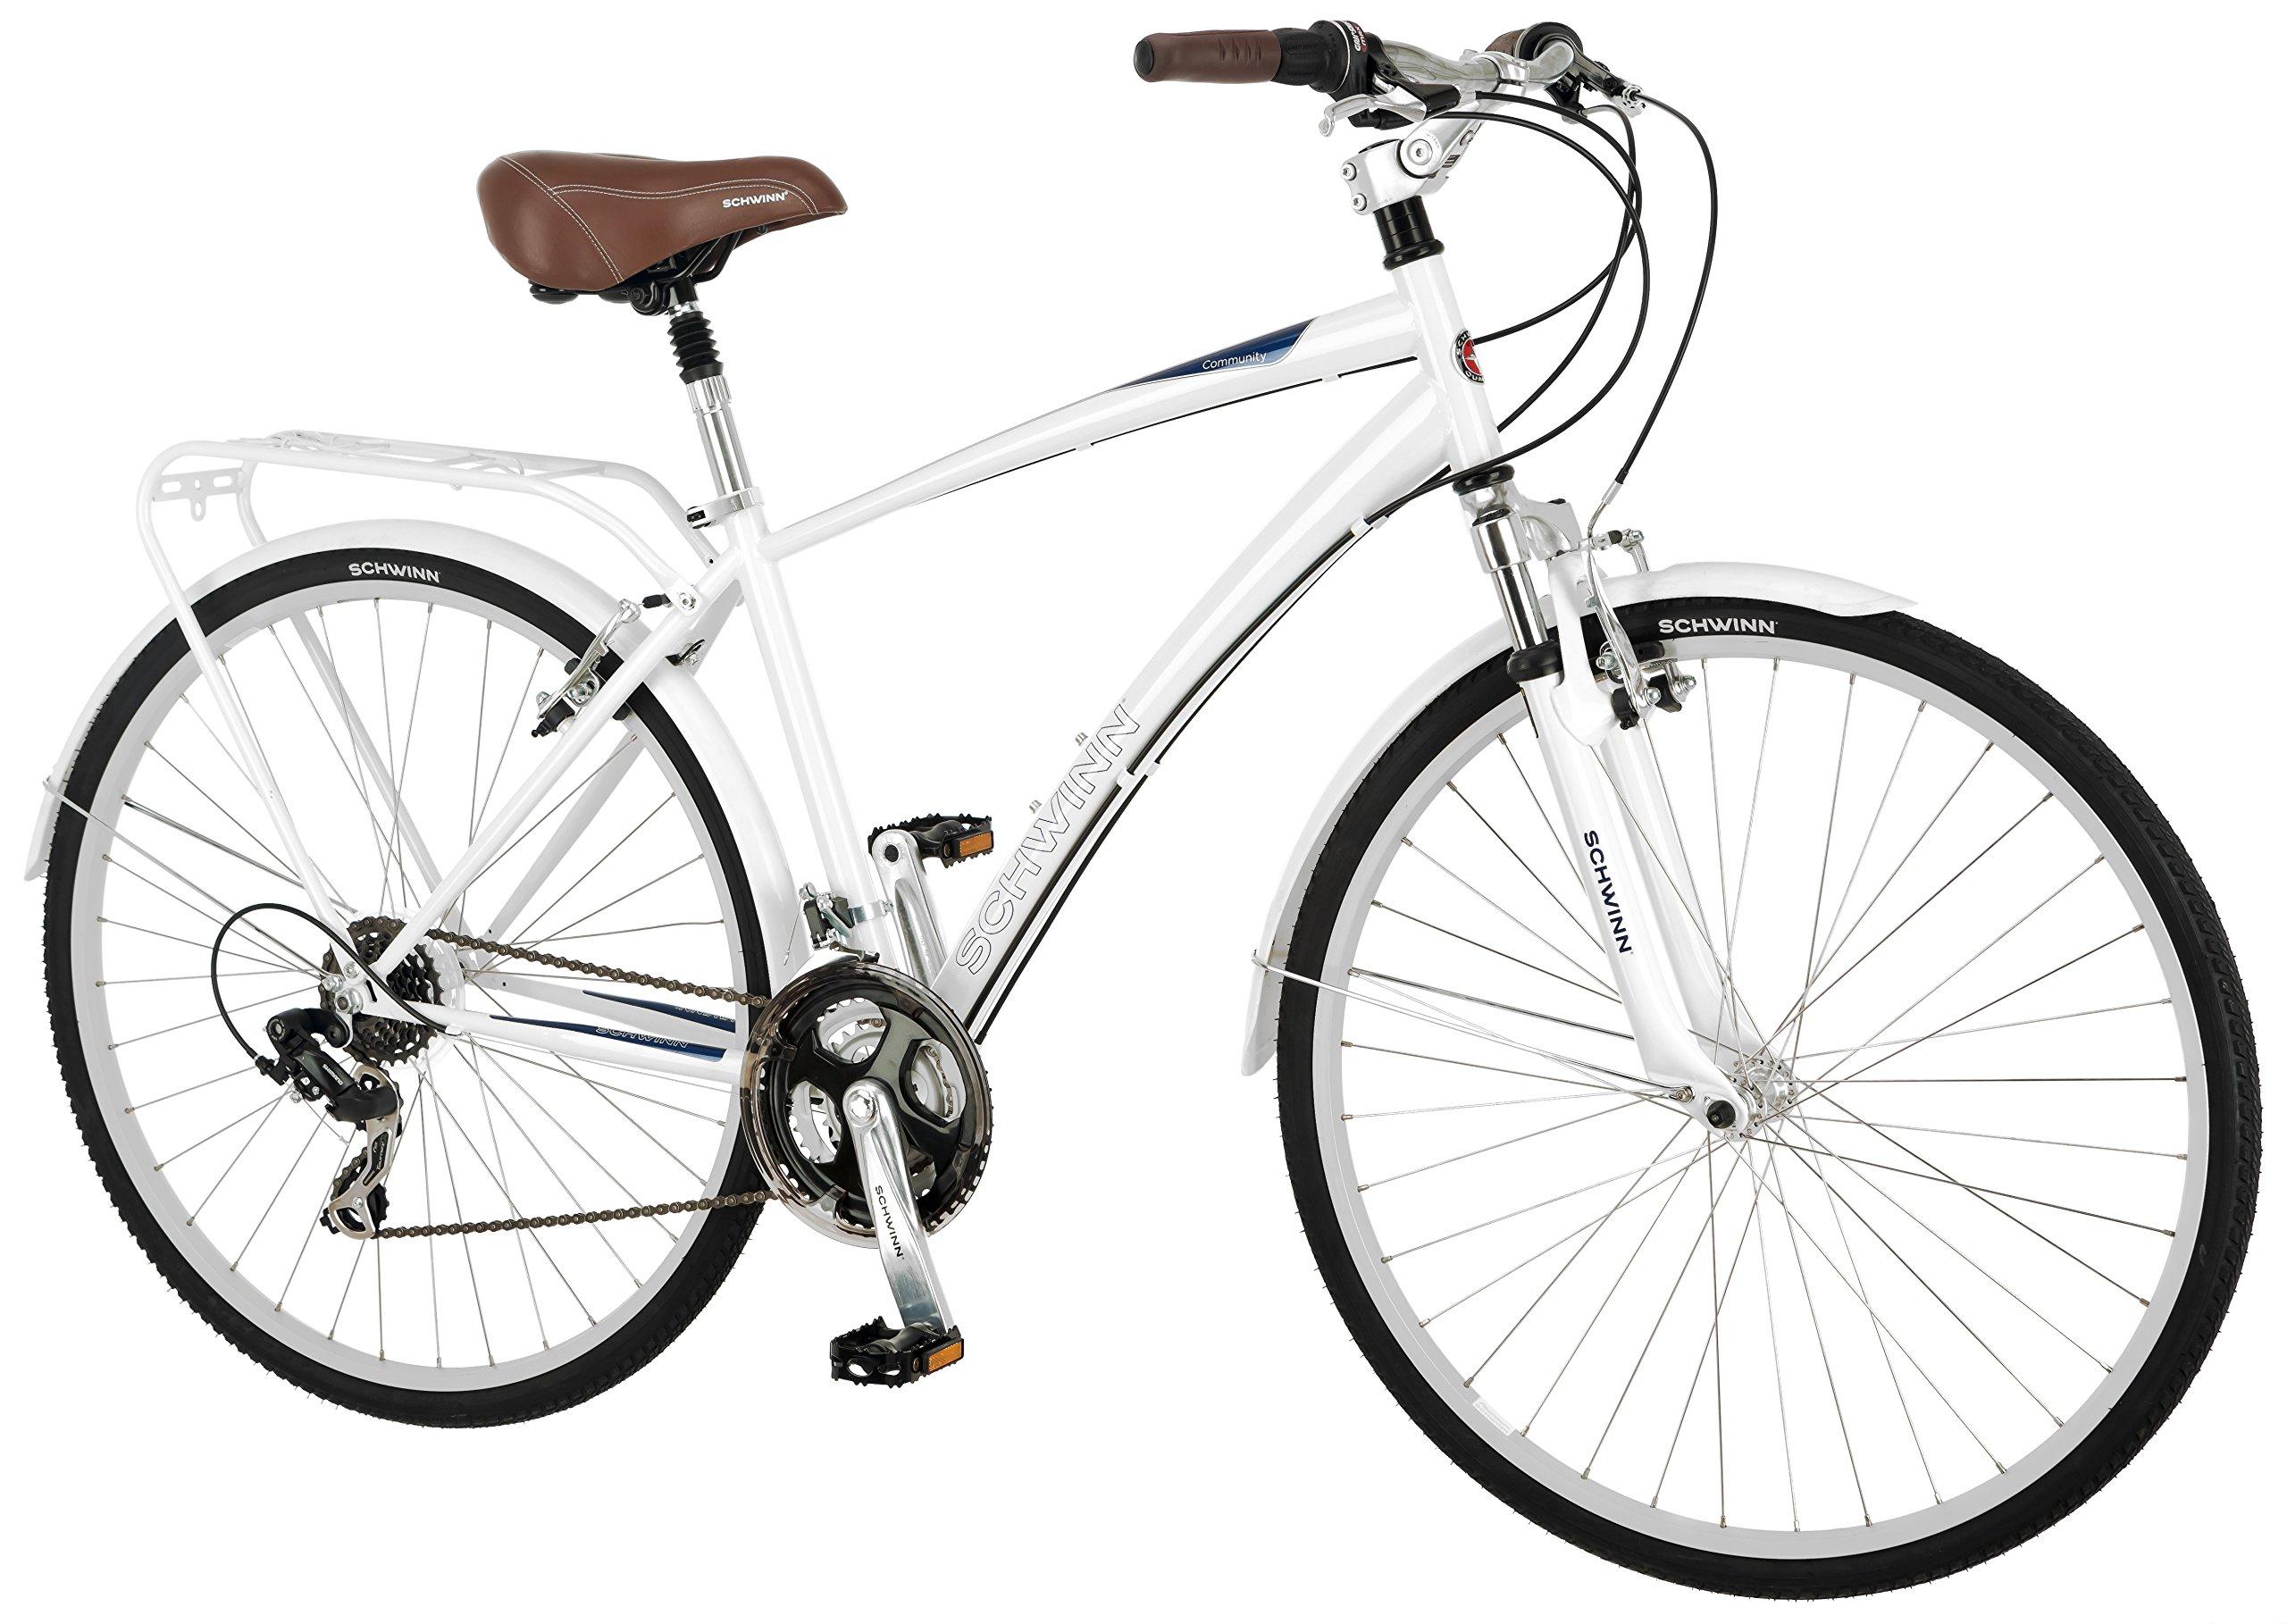 Schwinn Men's Community 700c Hybrid Bicycle, White, 18-Inch Frame by Schwinn (Image #2)